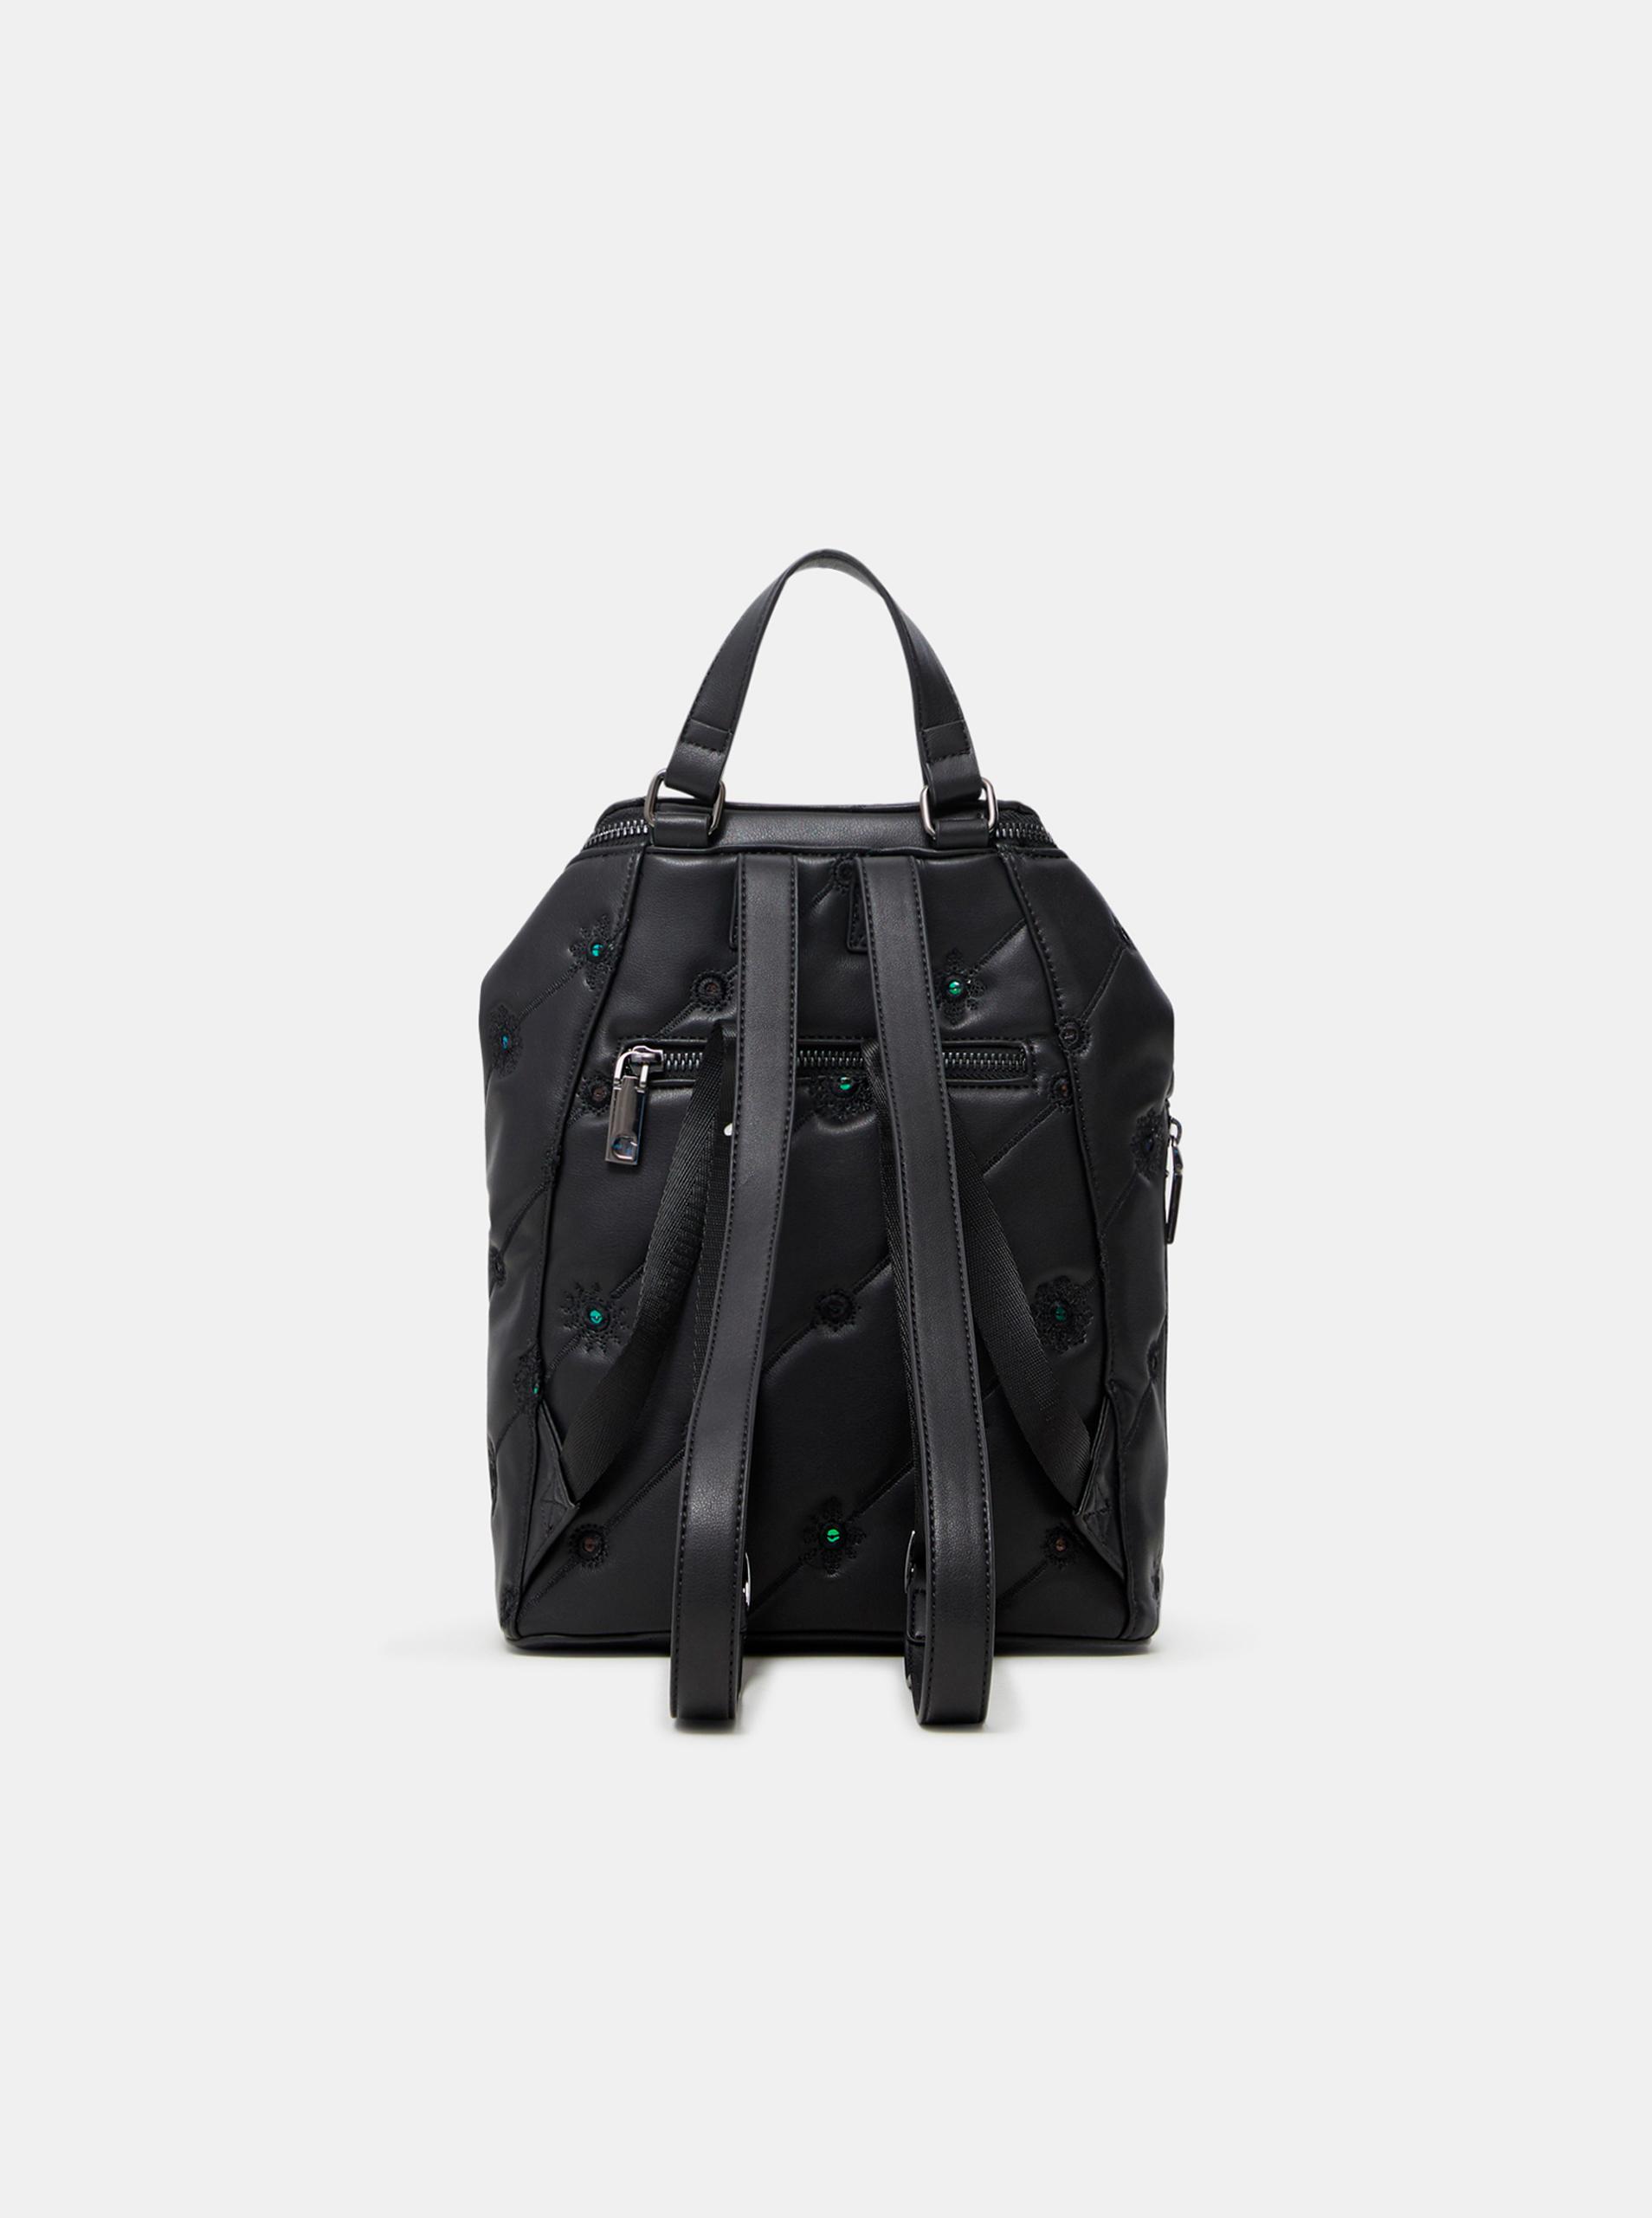 Desigual crna ruksak Ojo de Tigre Nerano Loen Mini